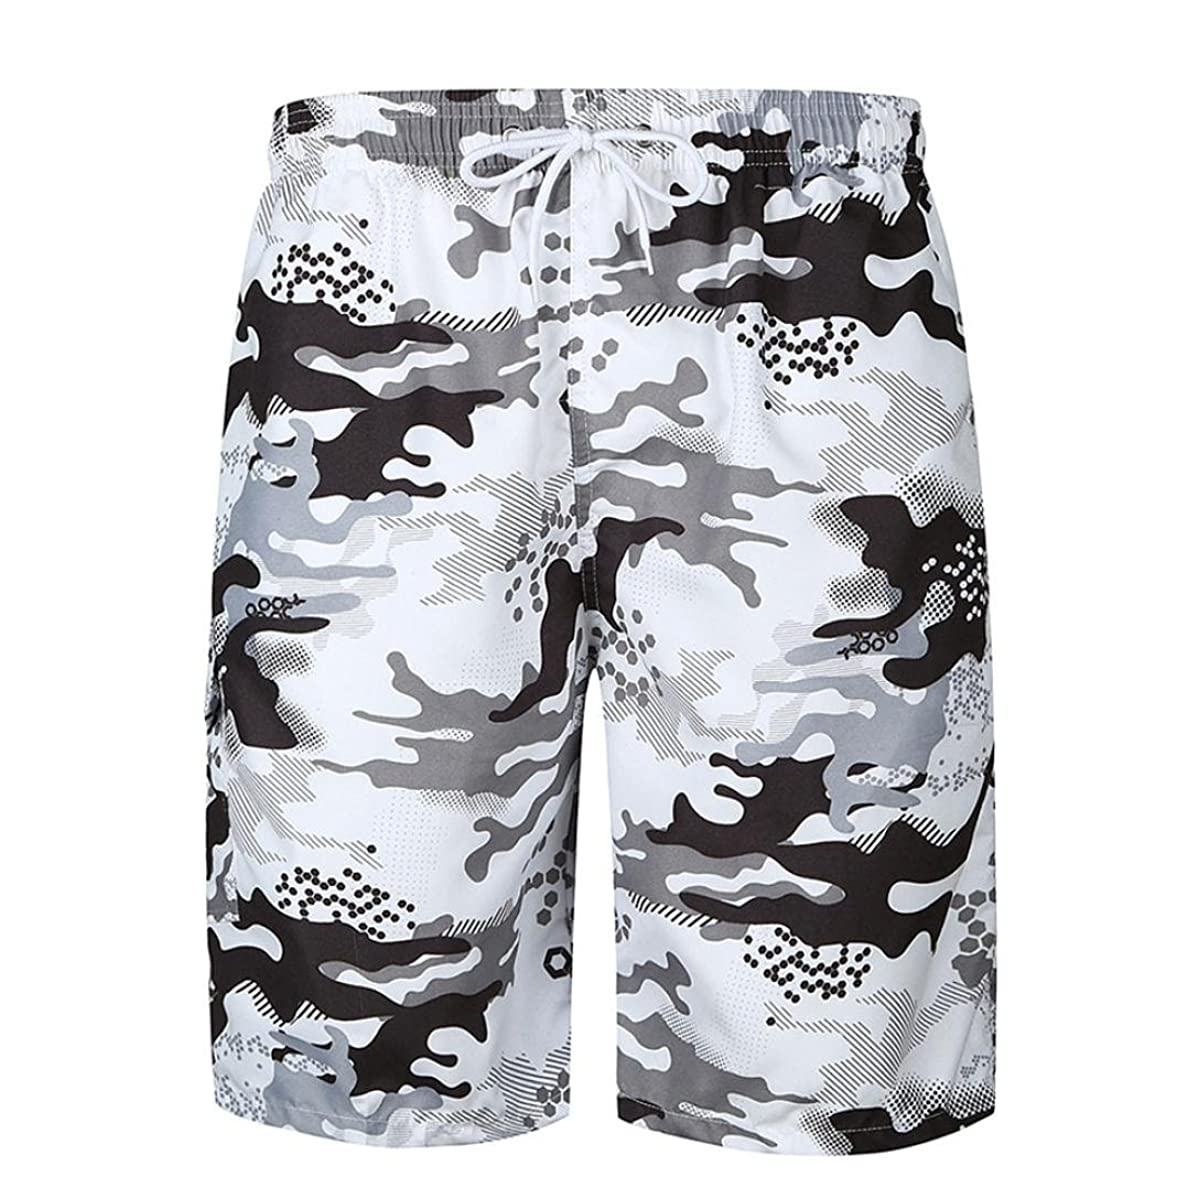 AMSKY?Mens Swim Trunks,Fashion Printing Beach Quick -Drying Home Adjustable Sportwear Running Surfing Shorts